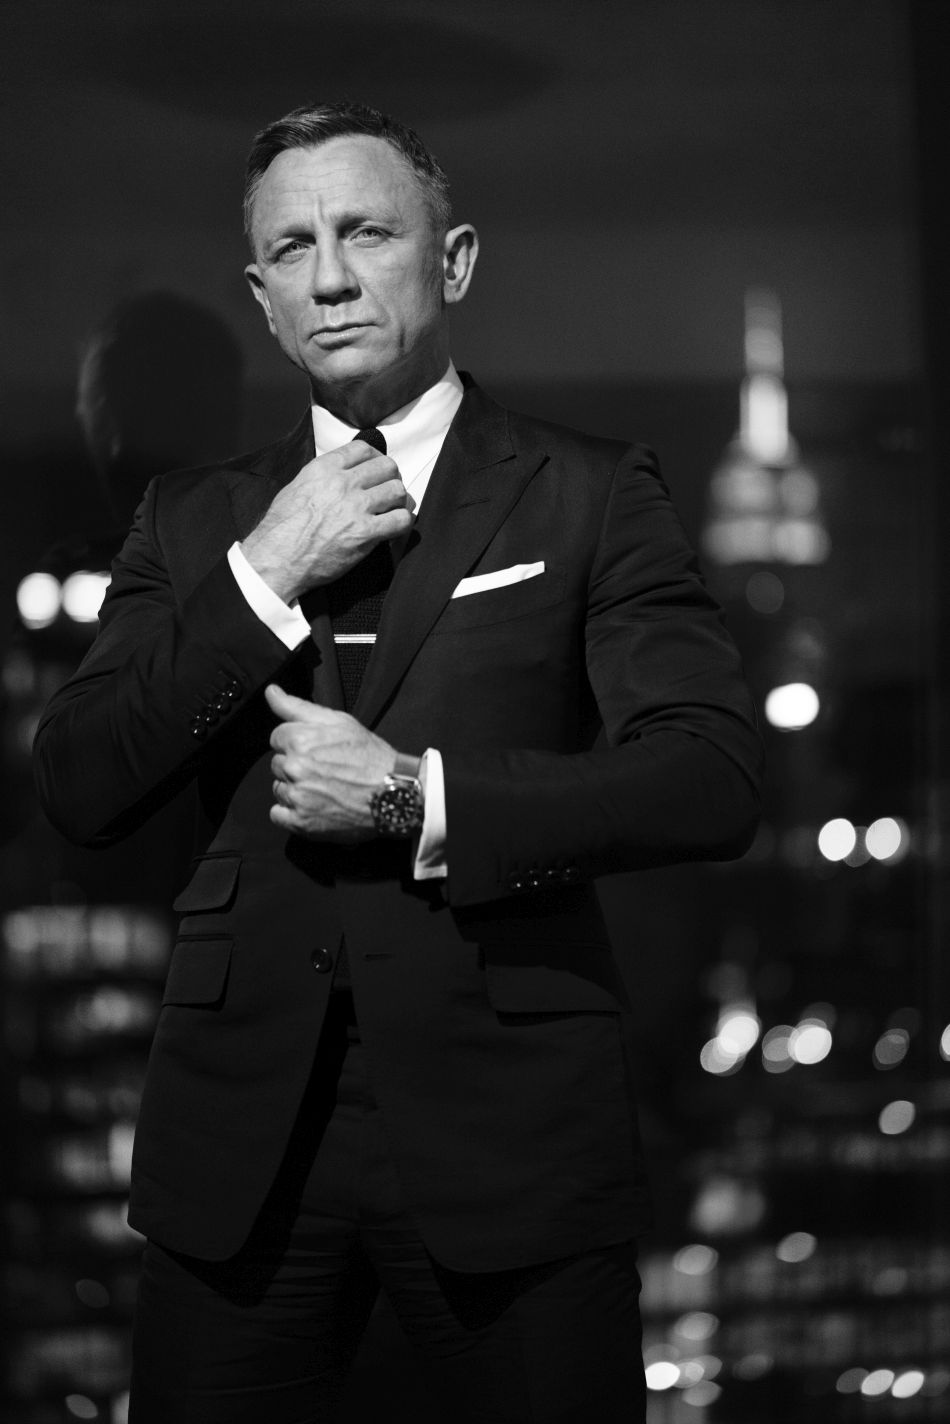 Daniel Craig @gregwilliamsphotography